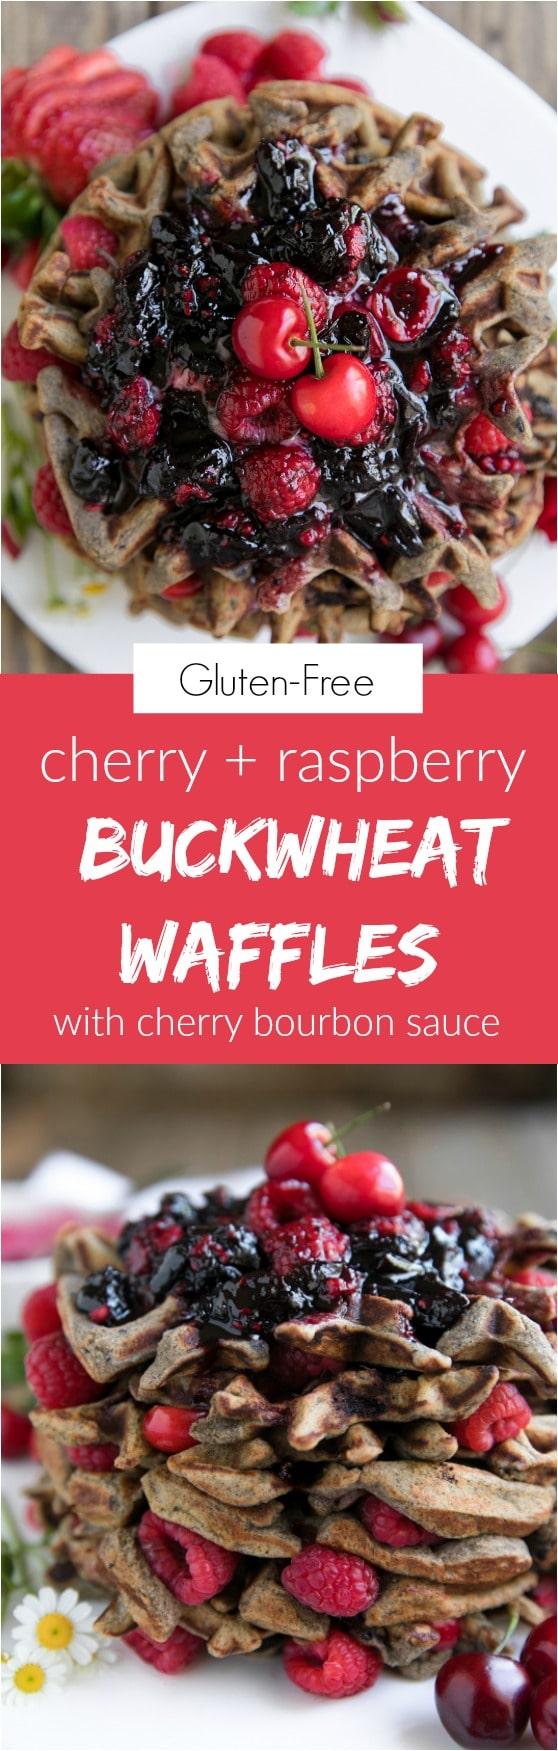 Gluten-Free Cherry Raspberry Buckwheat Waffles with Cherry Bourbon Sauce #breakfast #waffles #cherry #bourbon